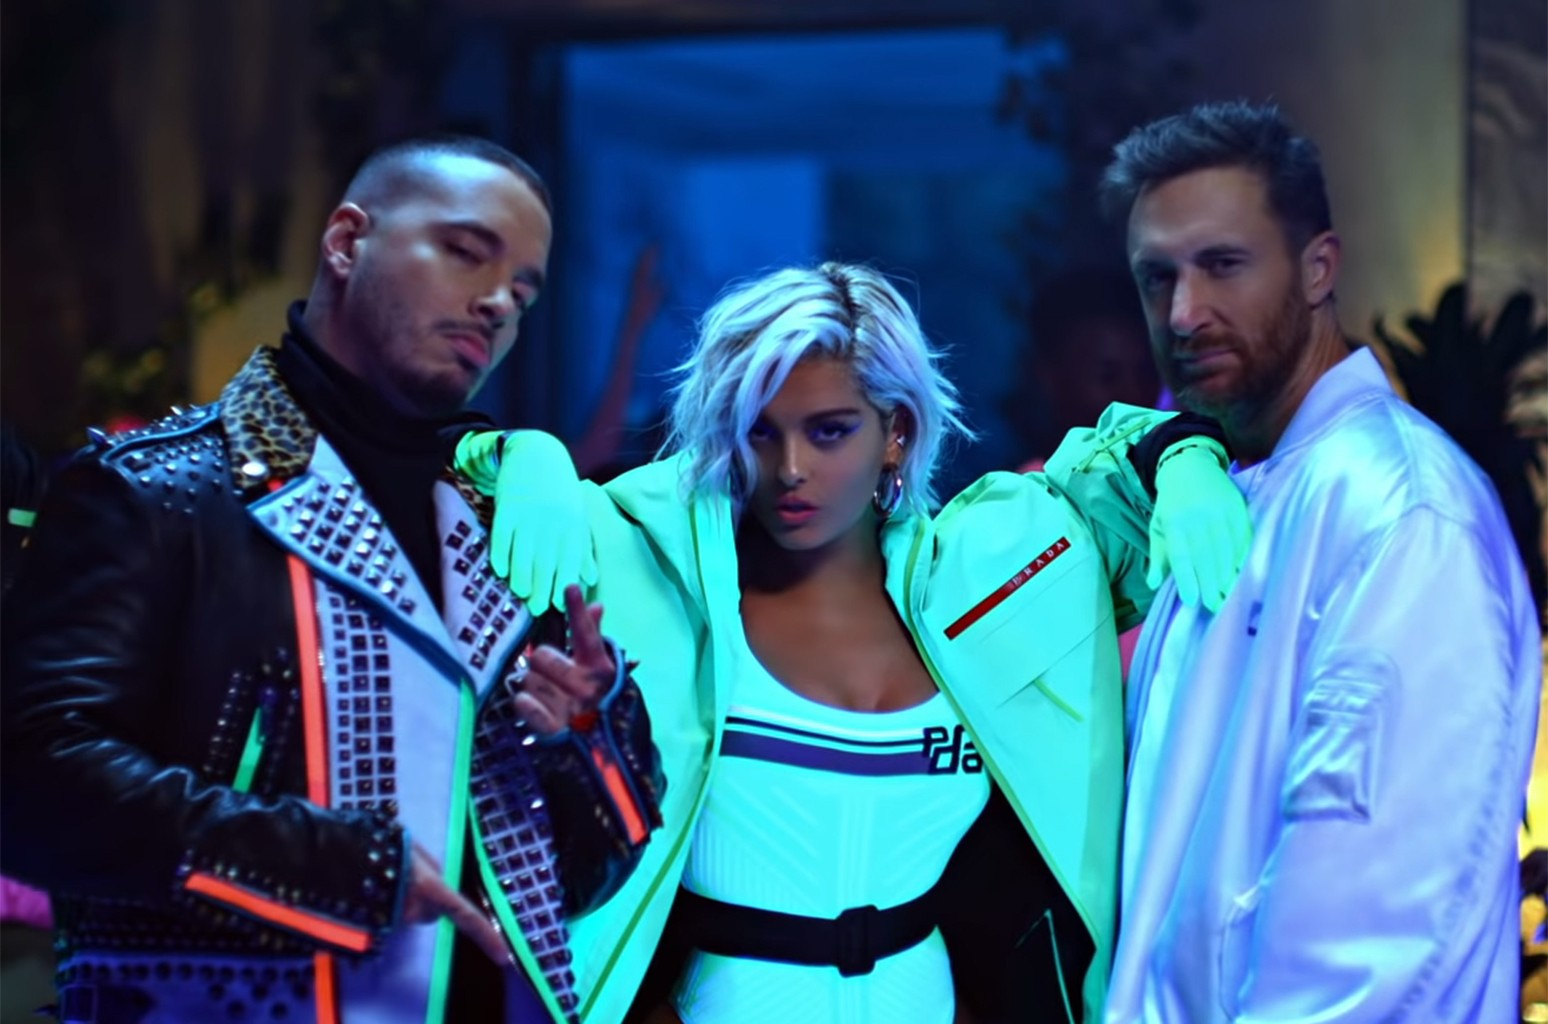 David Guetta Bebe Rexha J Balvin S Say My Name Video Watch Billboard Billboard